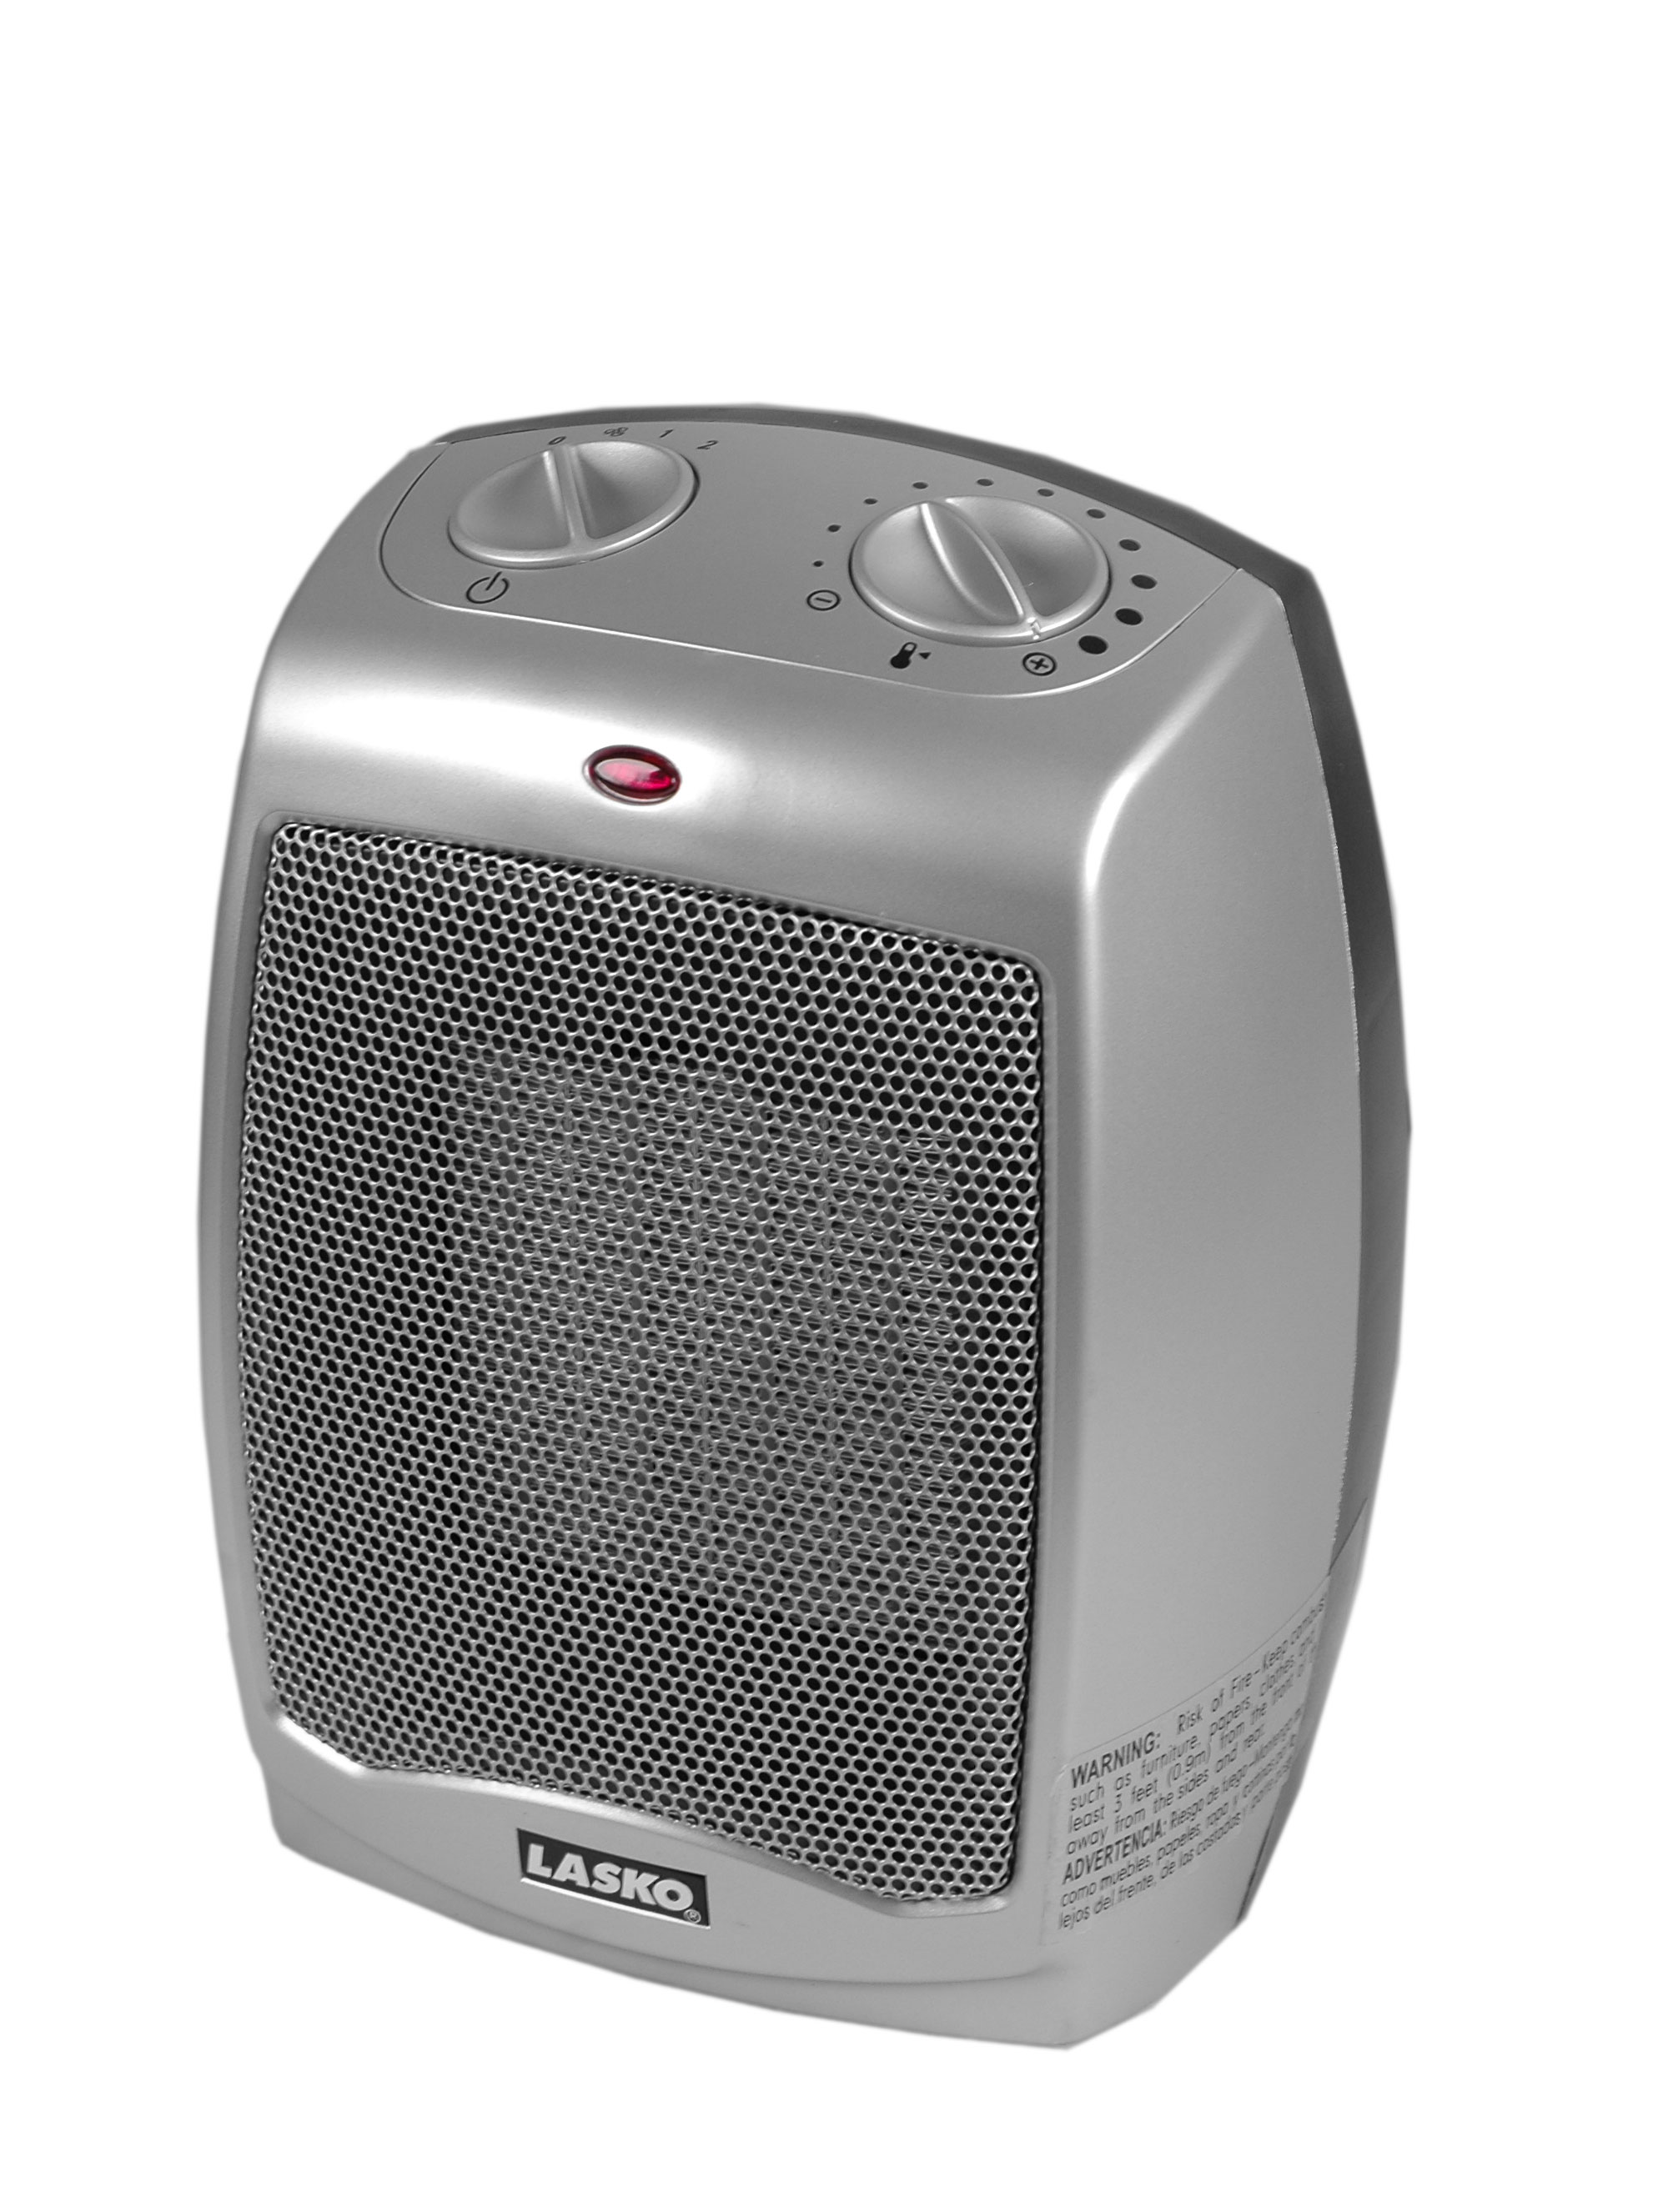 Lasko Electric Ceramic 1500W Heater Home Office Heating